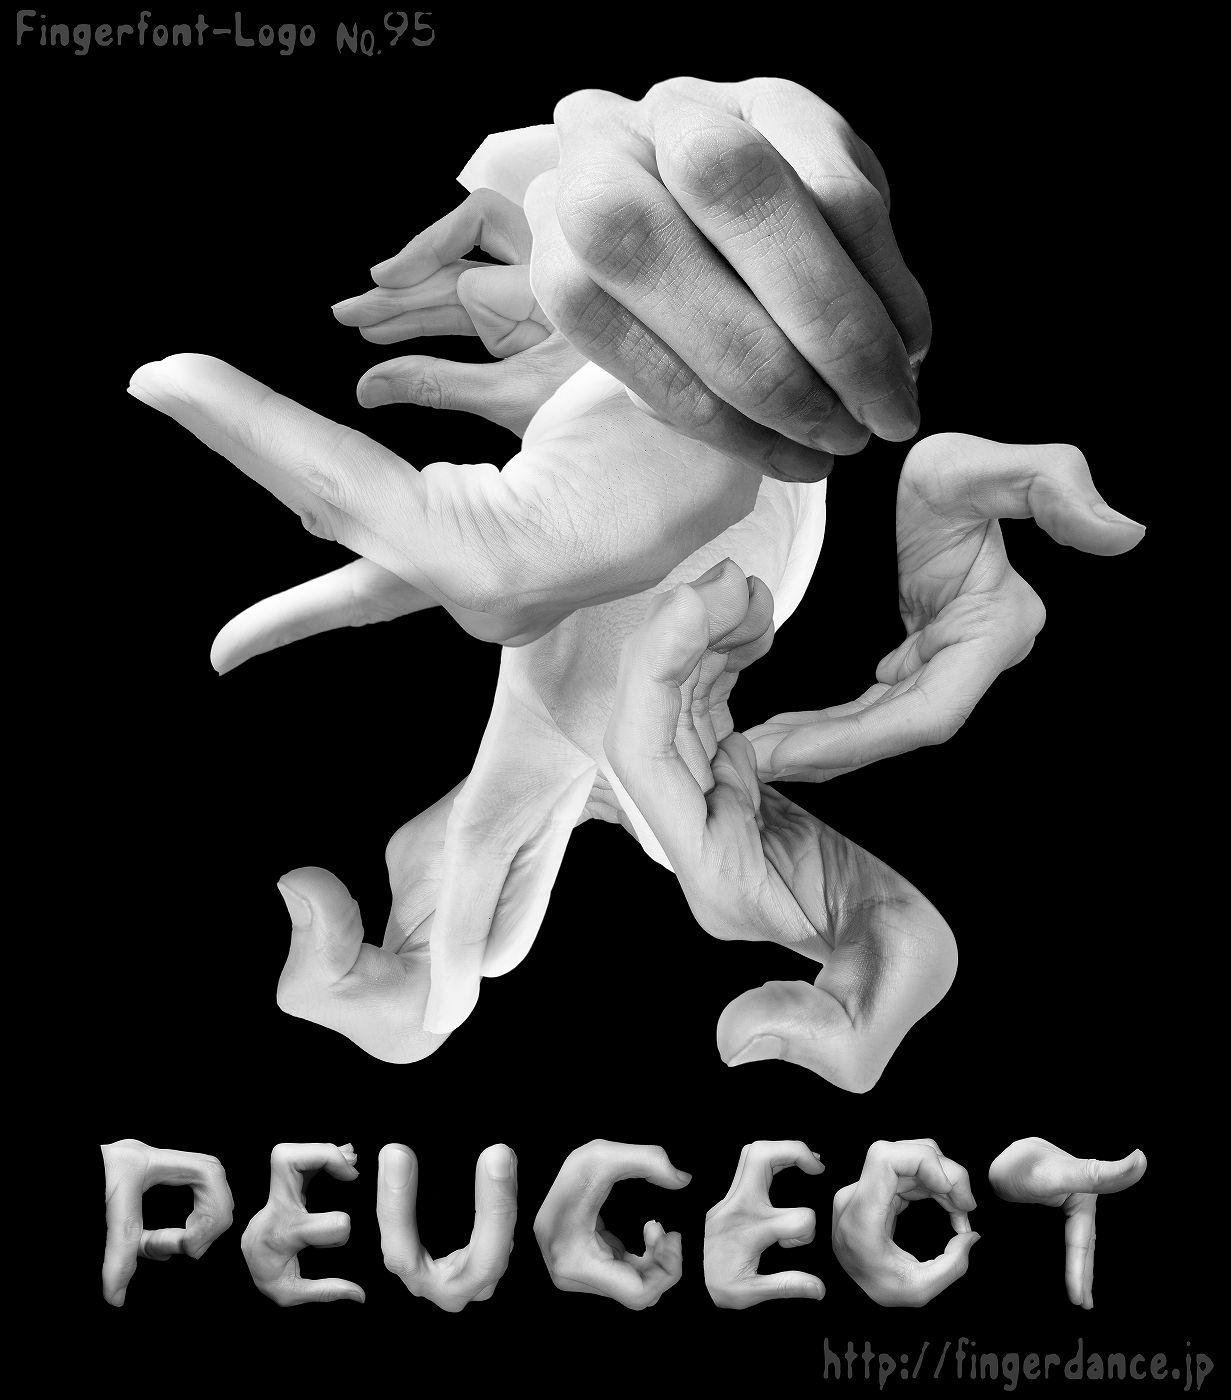 Peugeot , プジョー , Carlogo , 自動車ロゴ , 自動車ブランド , エンブレム [ Finger font